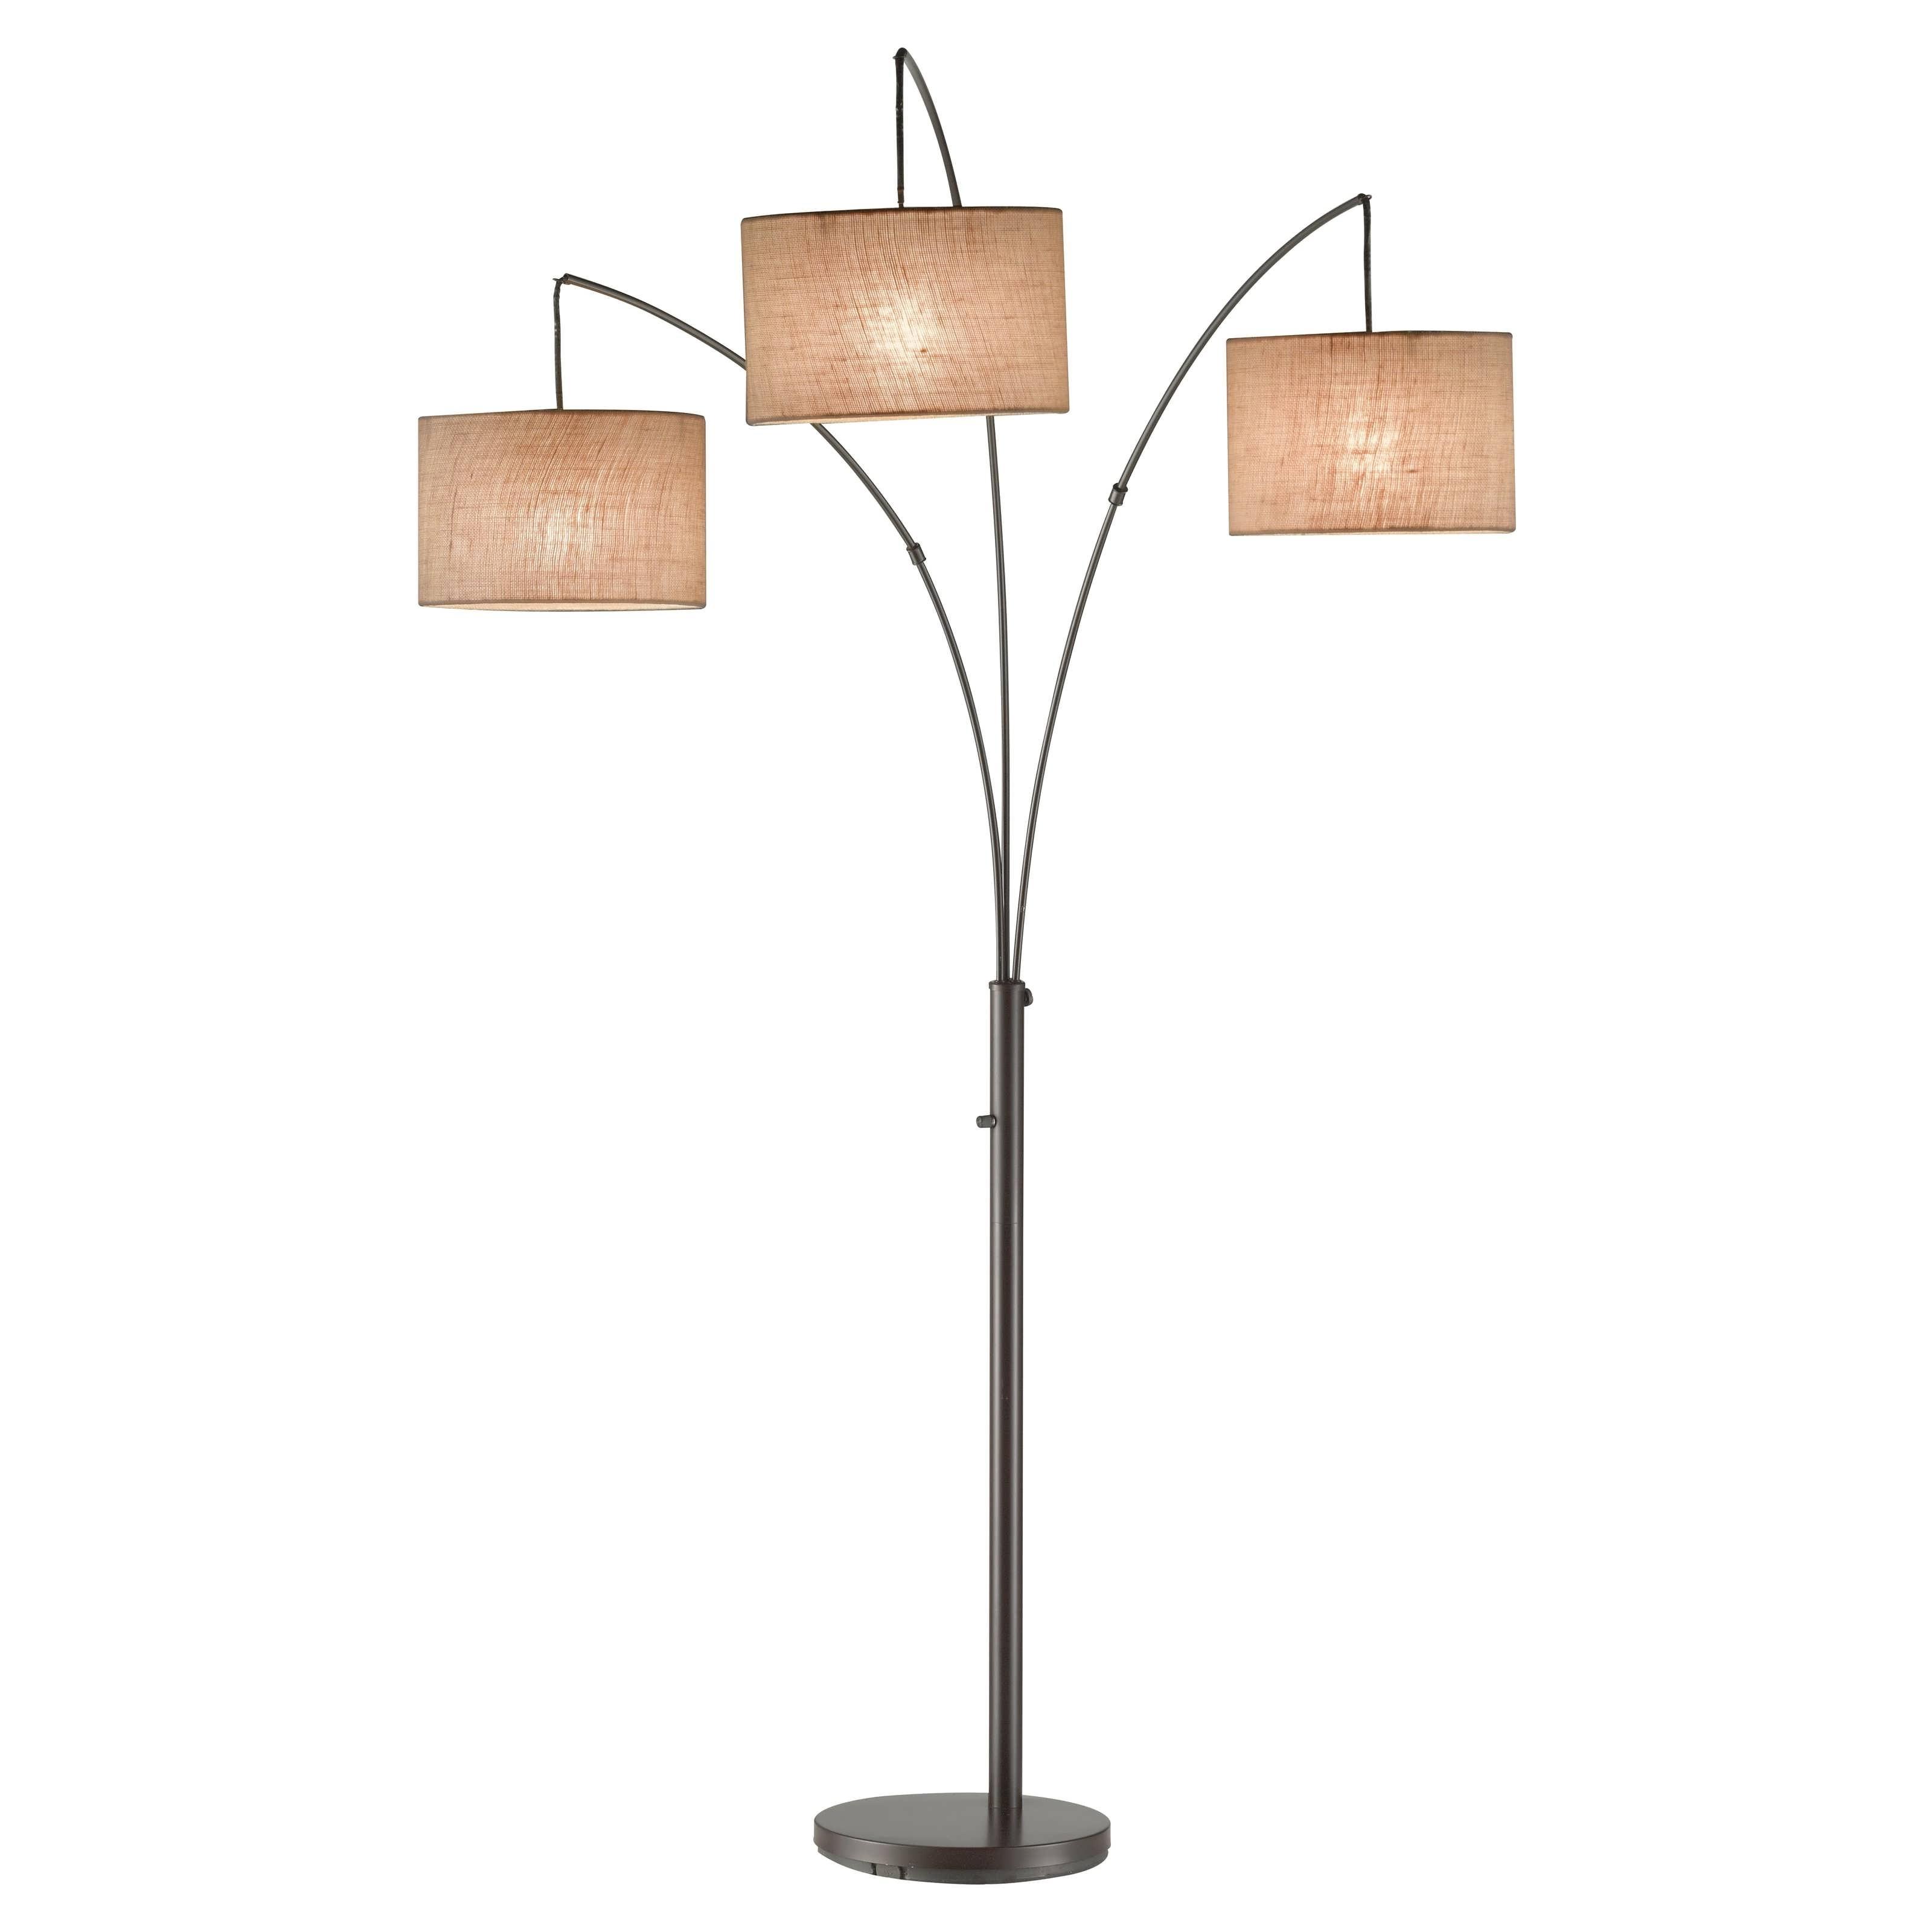 Light : Chandelier Shades Bathroom Chandeliers Led Floor Lamp For Most Current Standing Chandelier Floor Lamps (View 7 of 20)